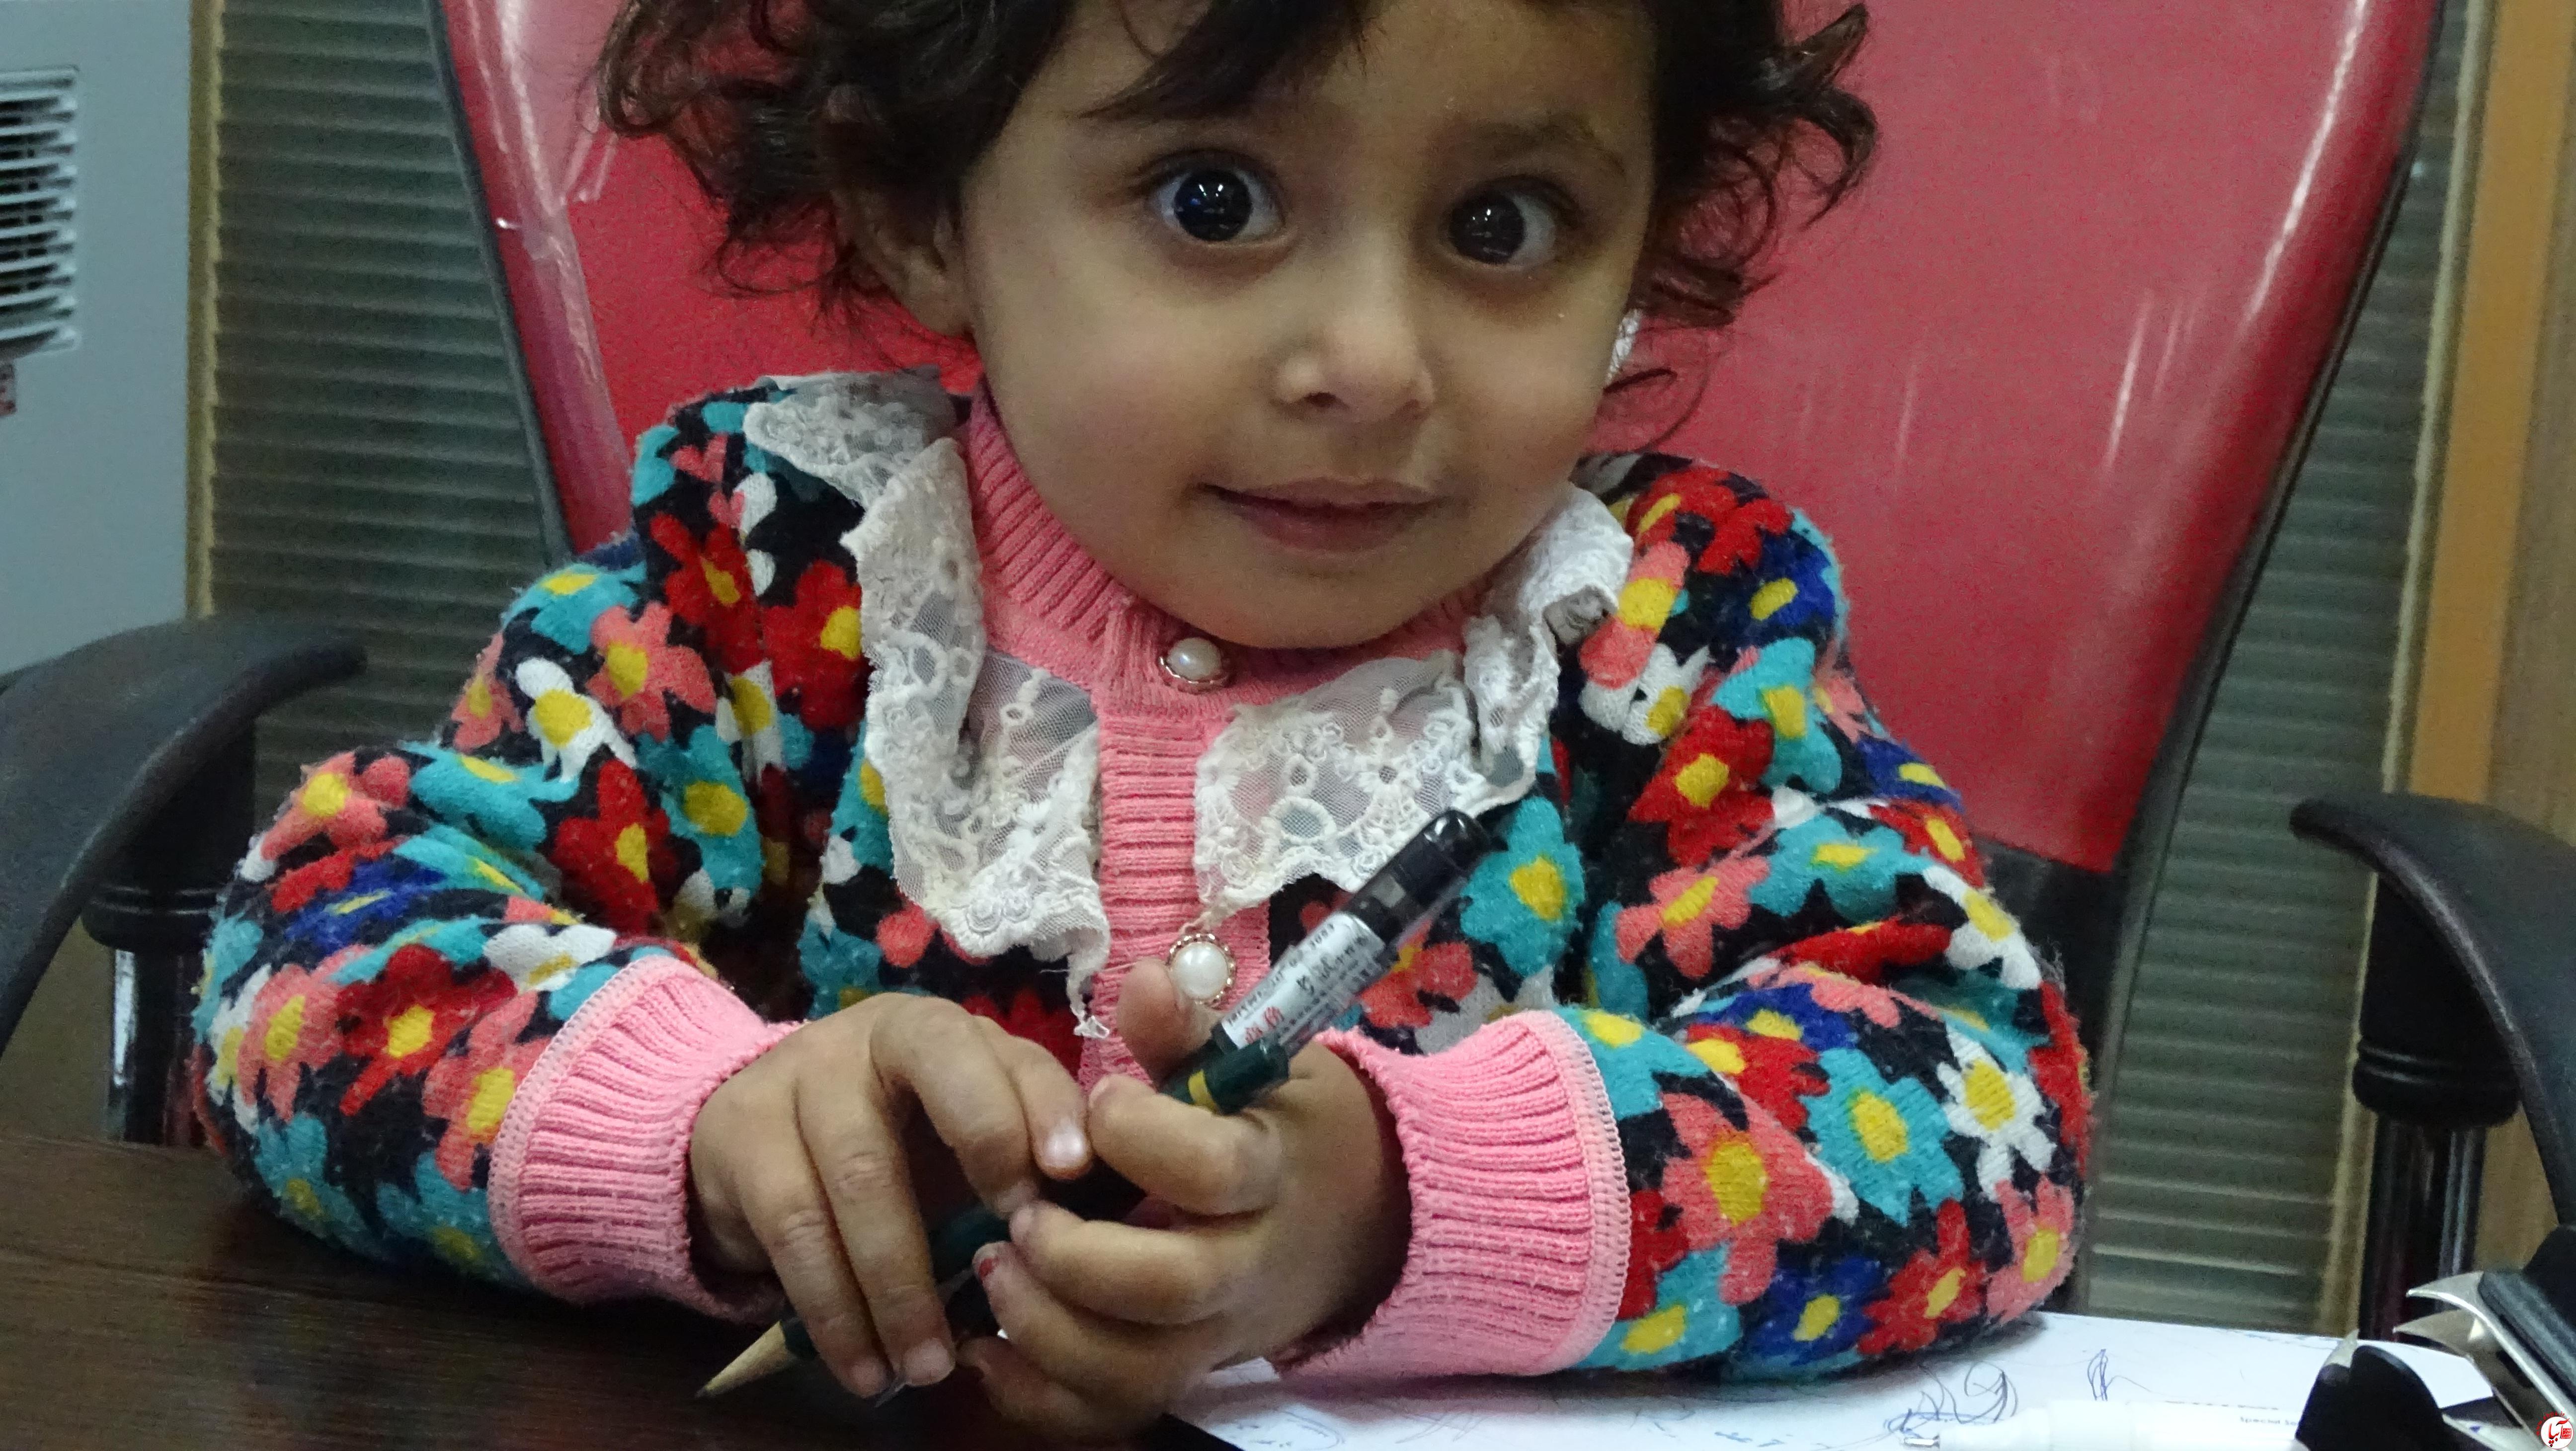 زهرا-عزیزی گالری عکس زمستانه ی کودک آبپا